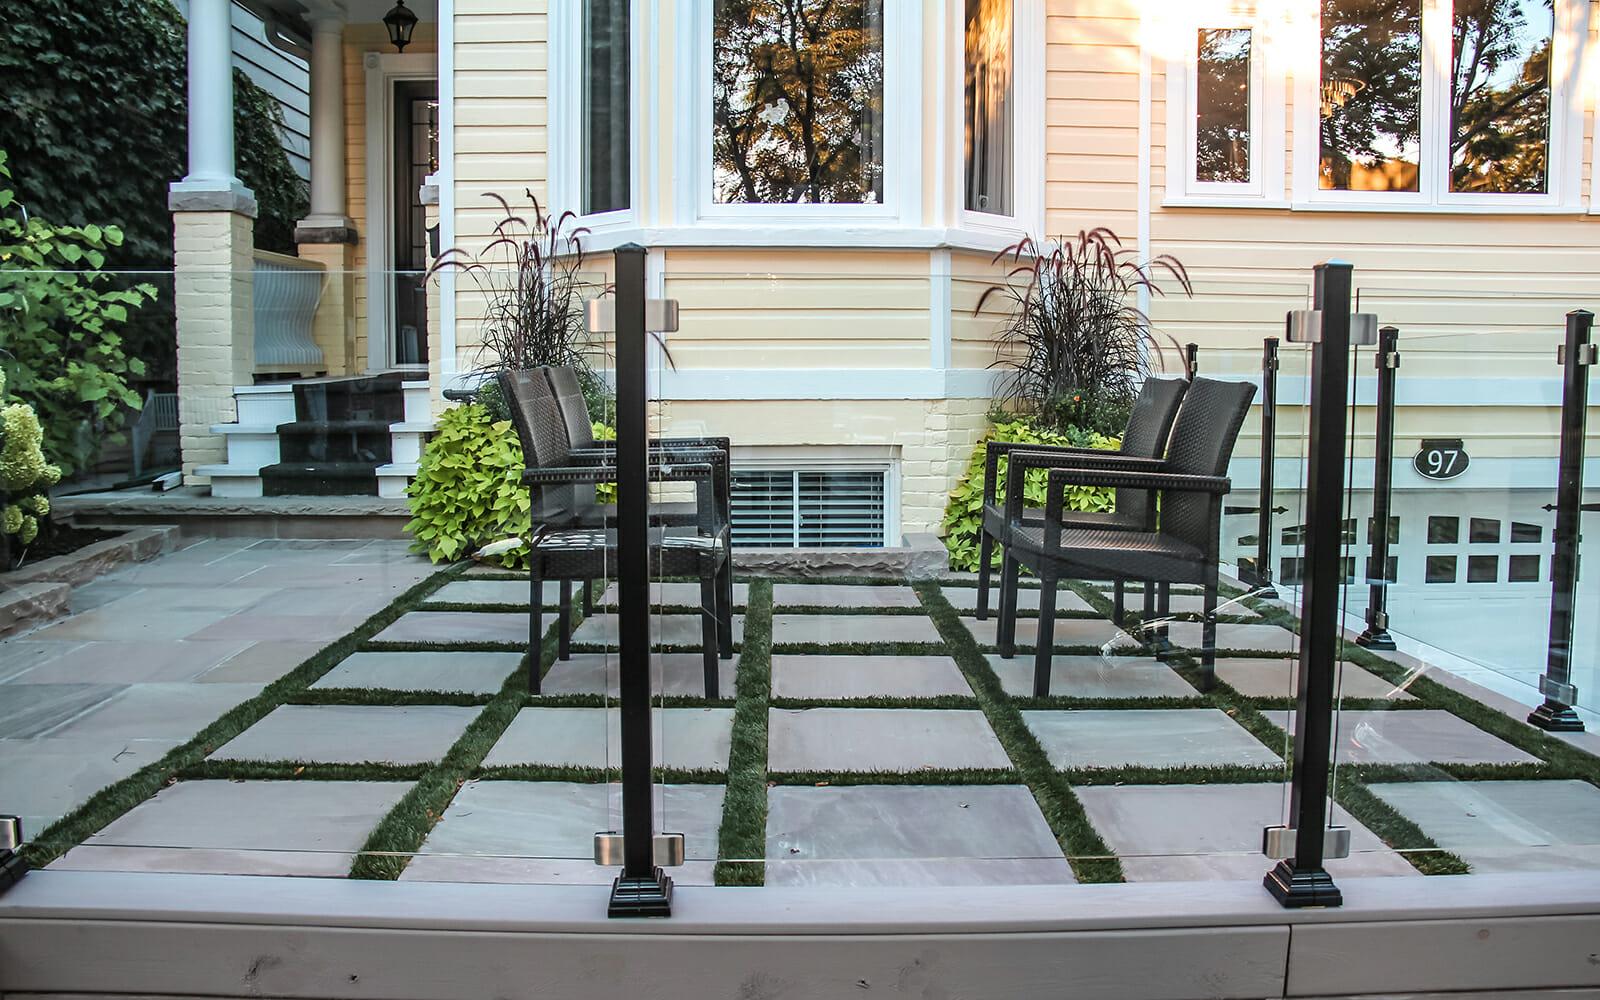 Toronto Front Yard Interlocking & Aluminum Glass Railings Project by The Toronto Landscaping Company.